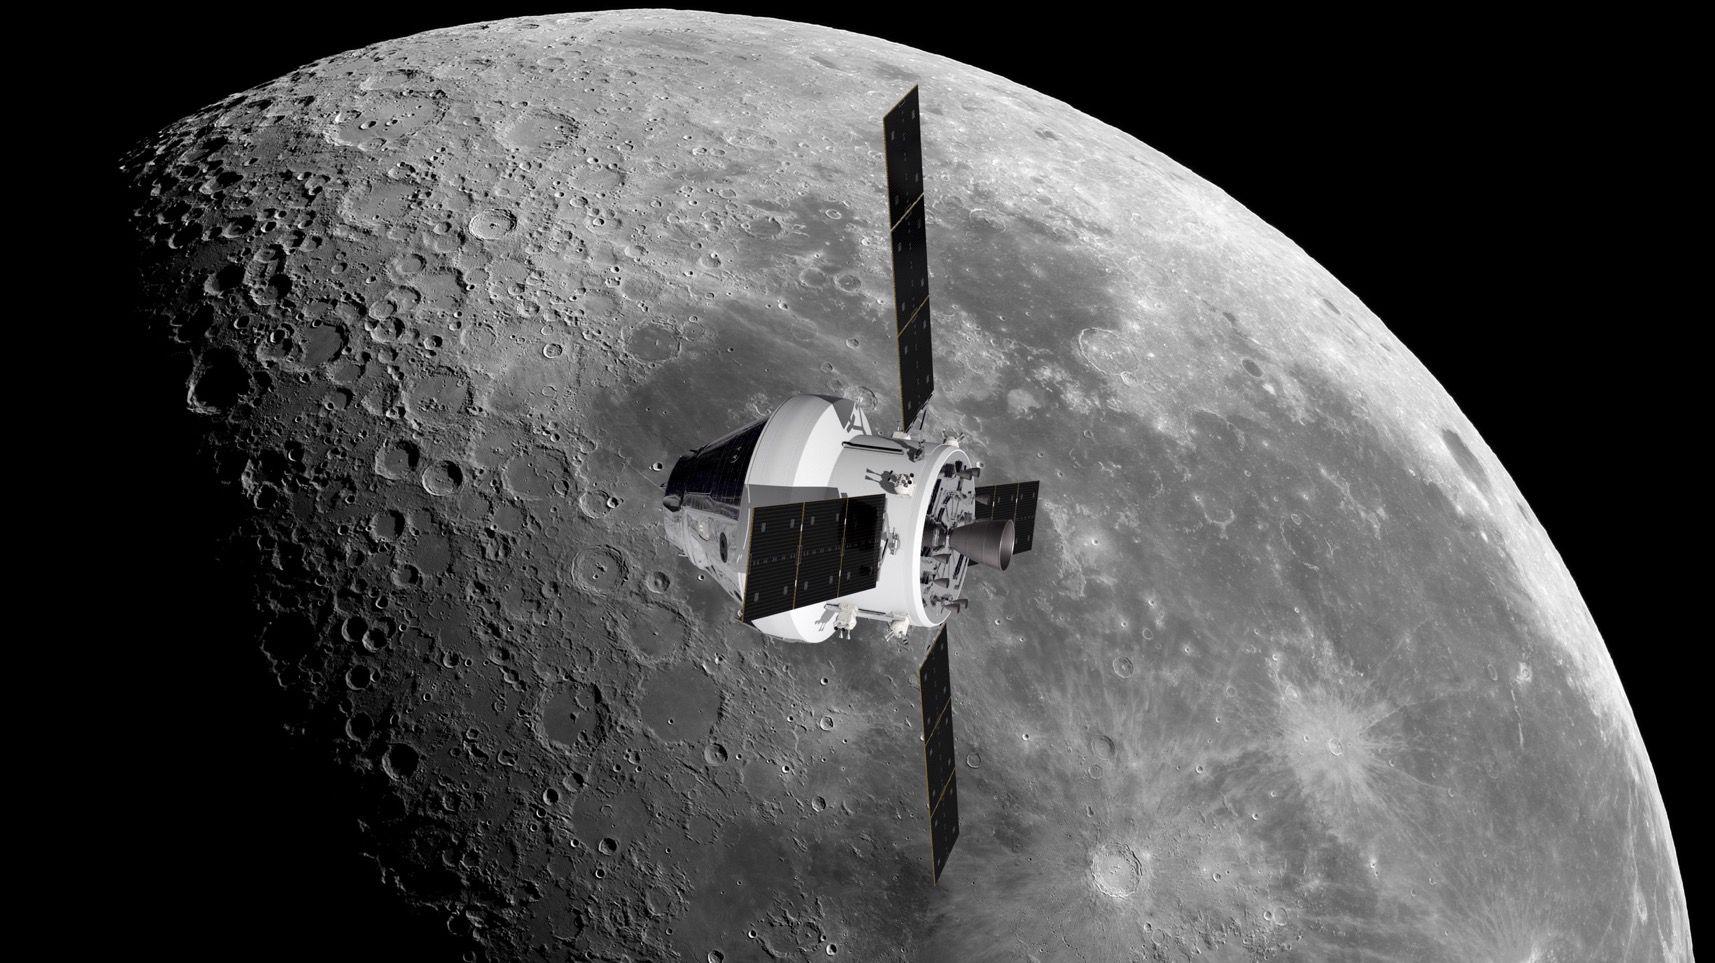 C'est Airbus Space qui posera les astronautes sur la Lune en 2024